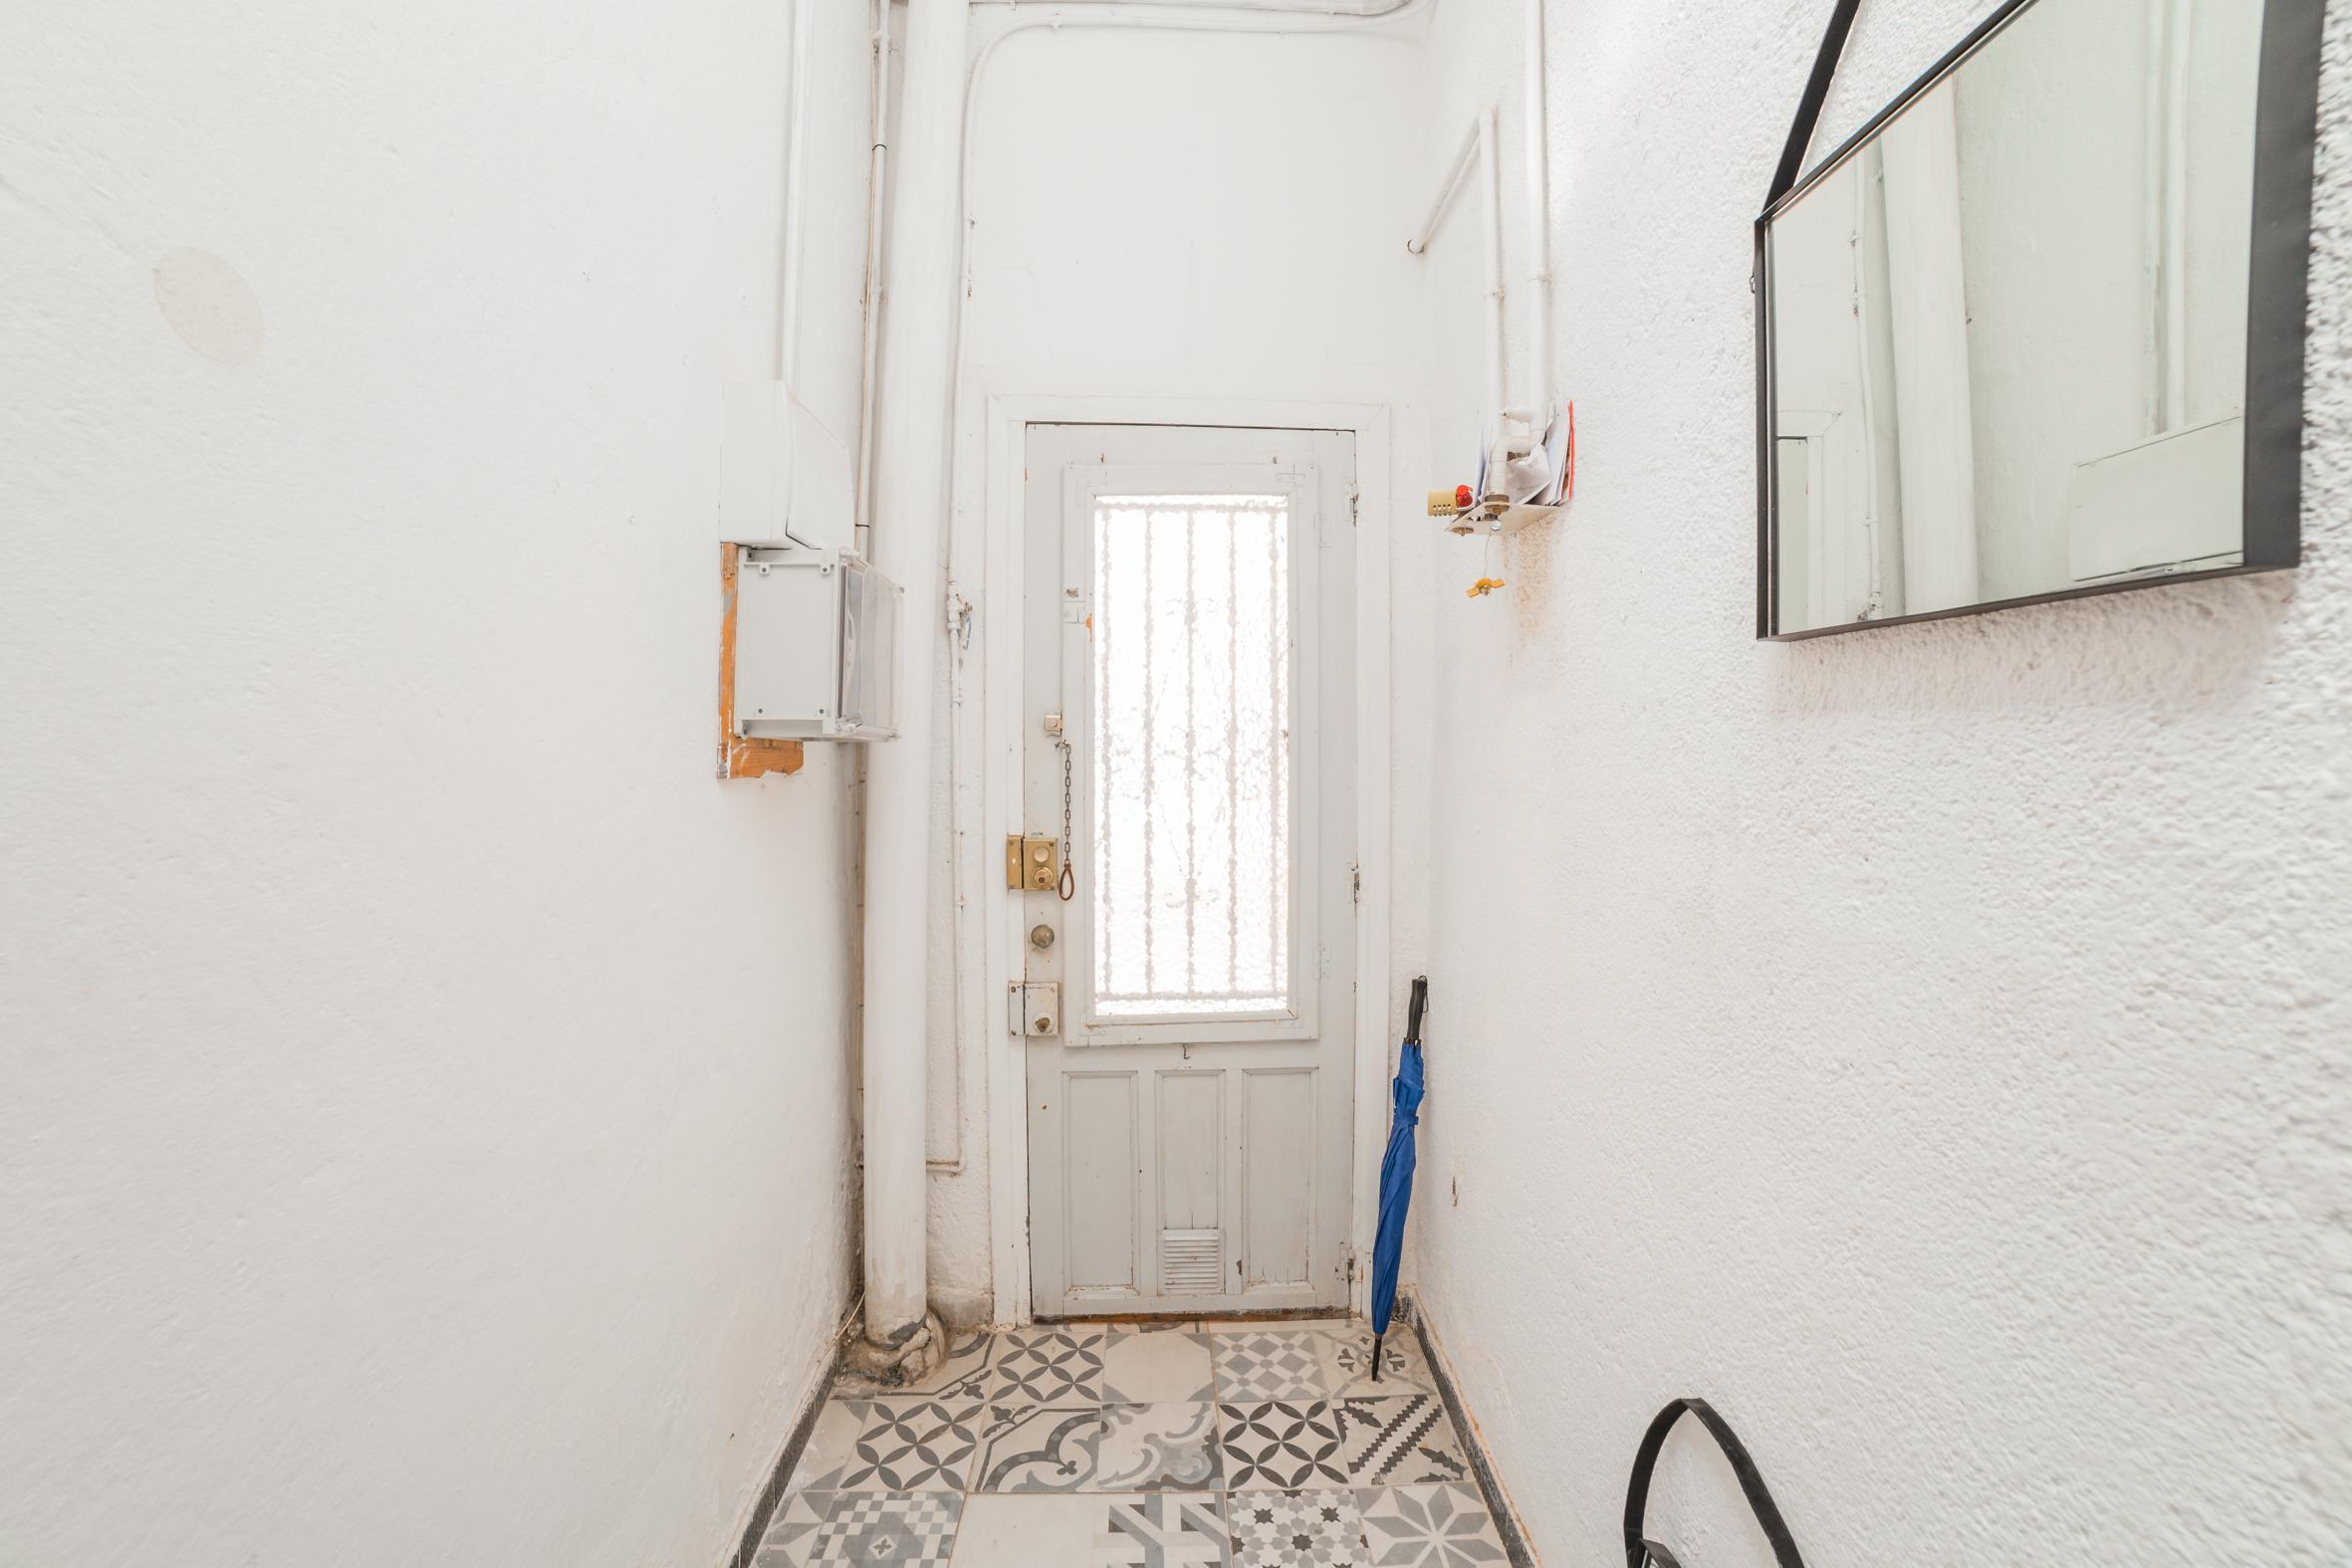 251960 House for sale in Eixample, Sagrada Familia 7